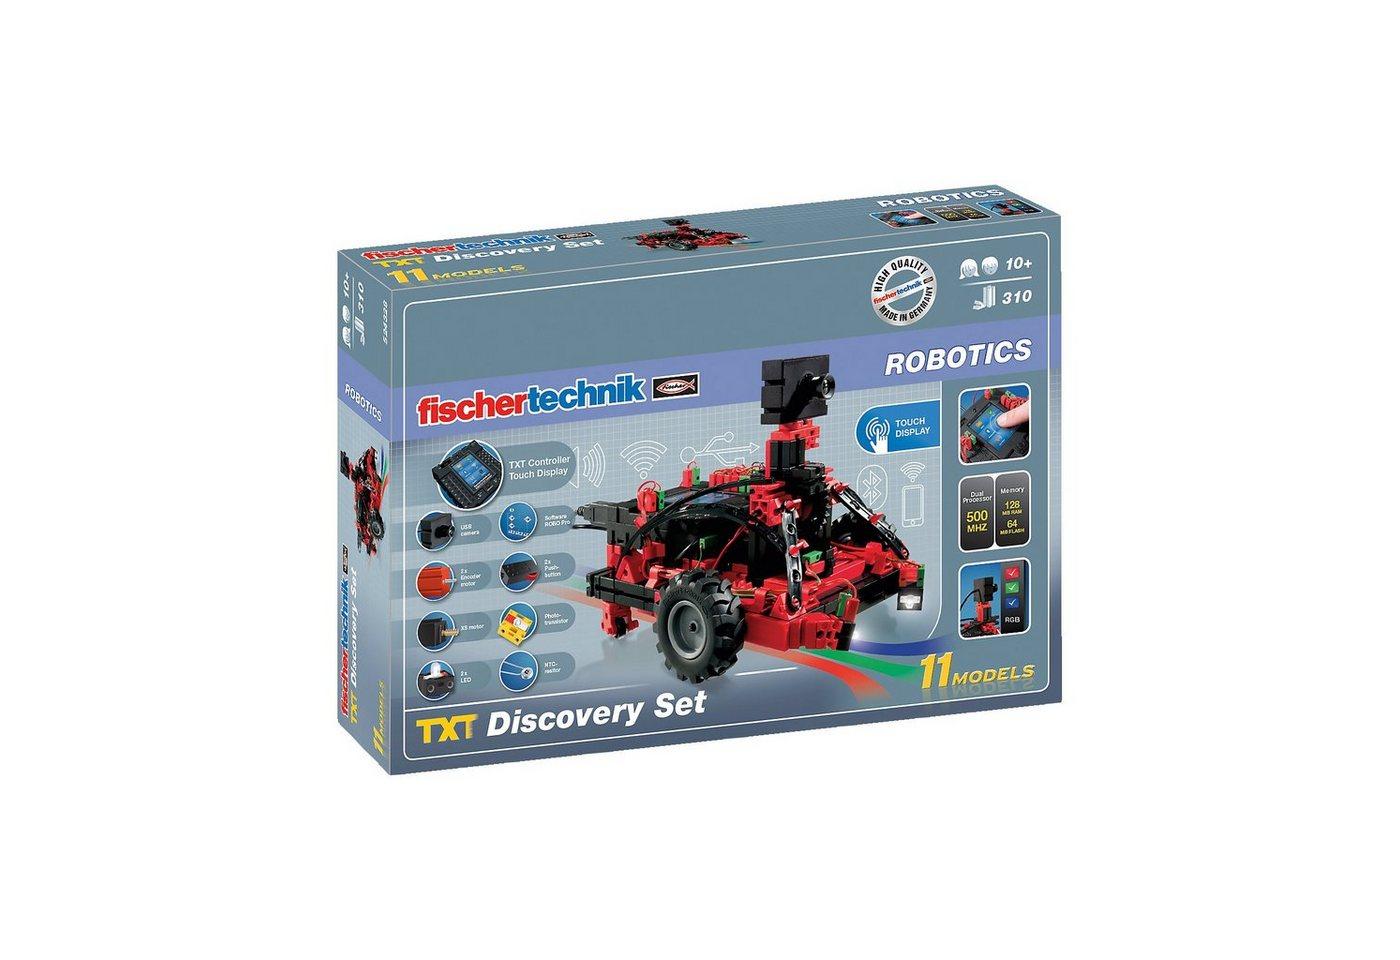 fischertechnik TXT Discovery Set